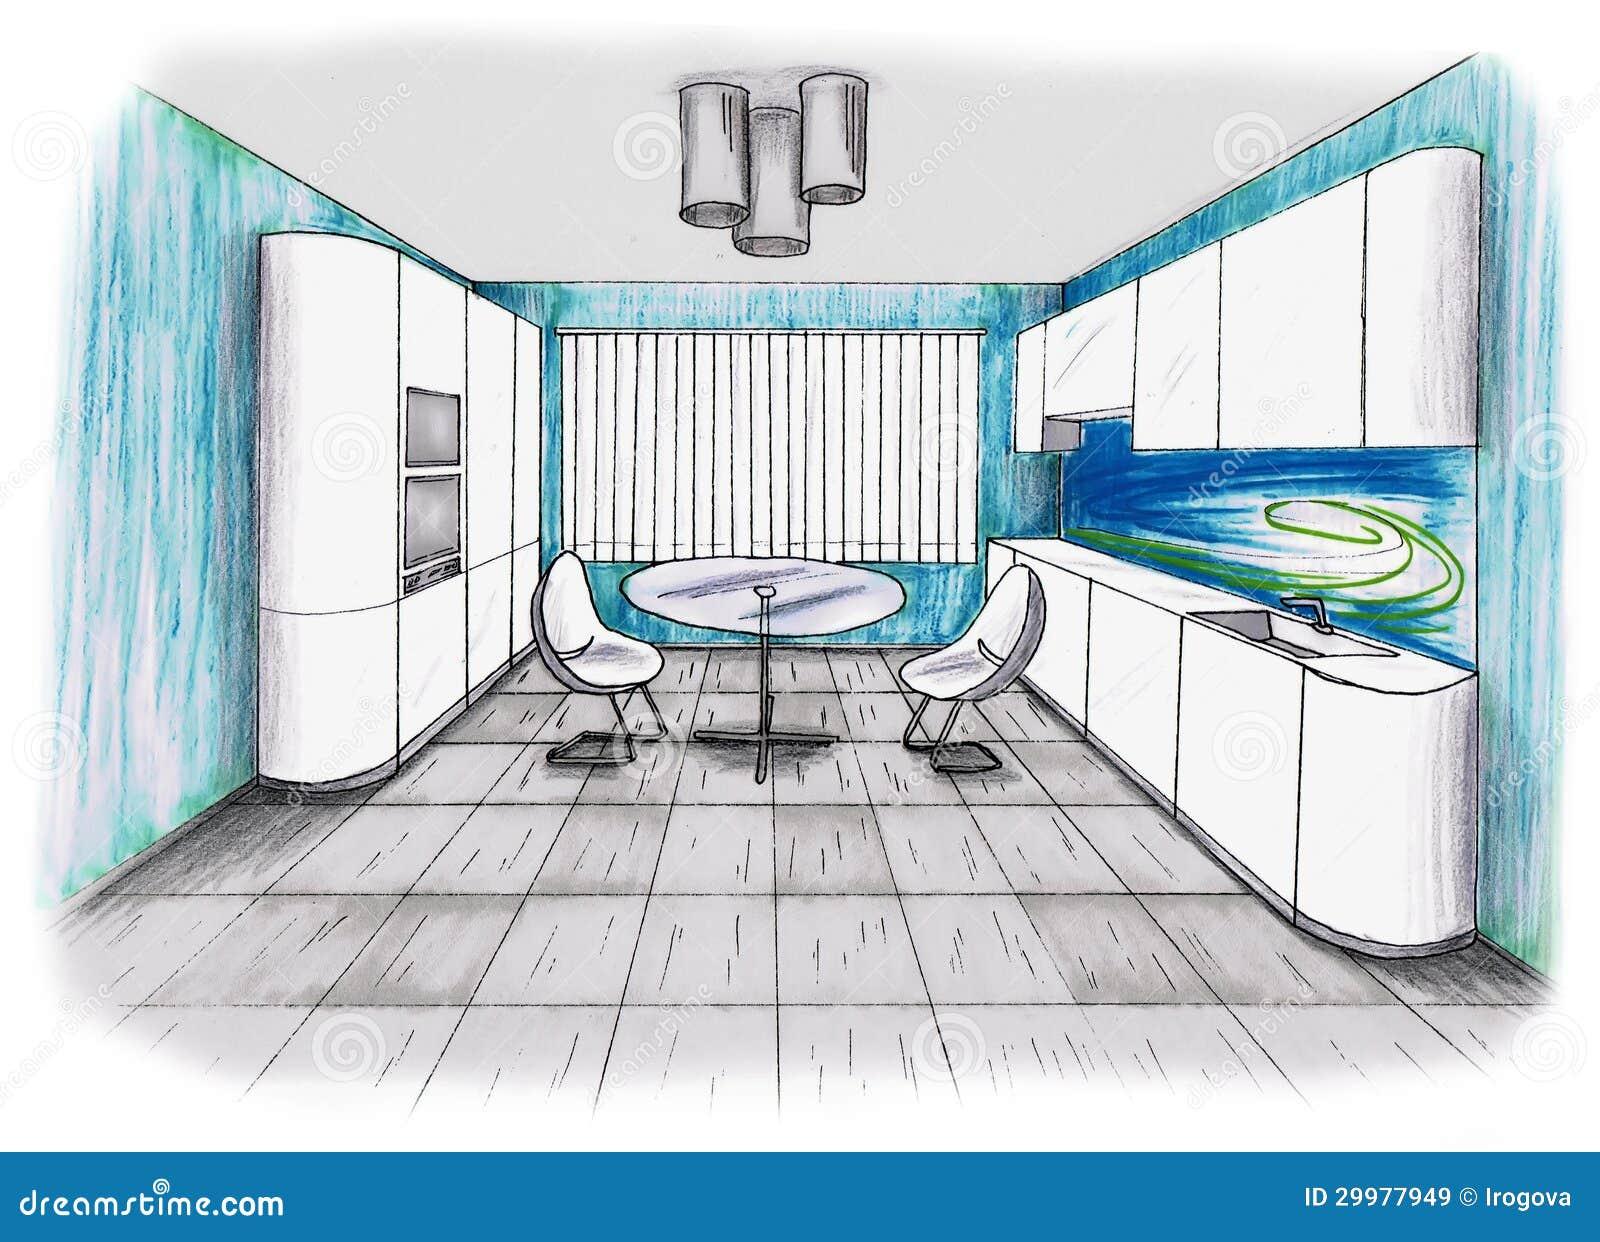 Graphic sketch an kitchen stock illustration. Illustration of ...